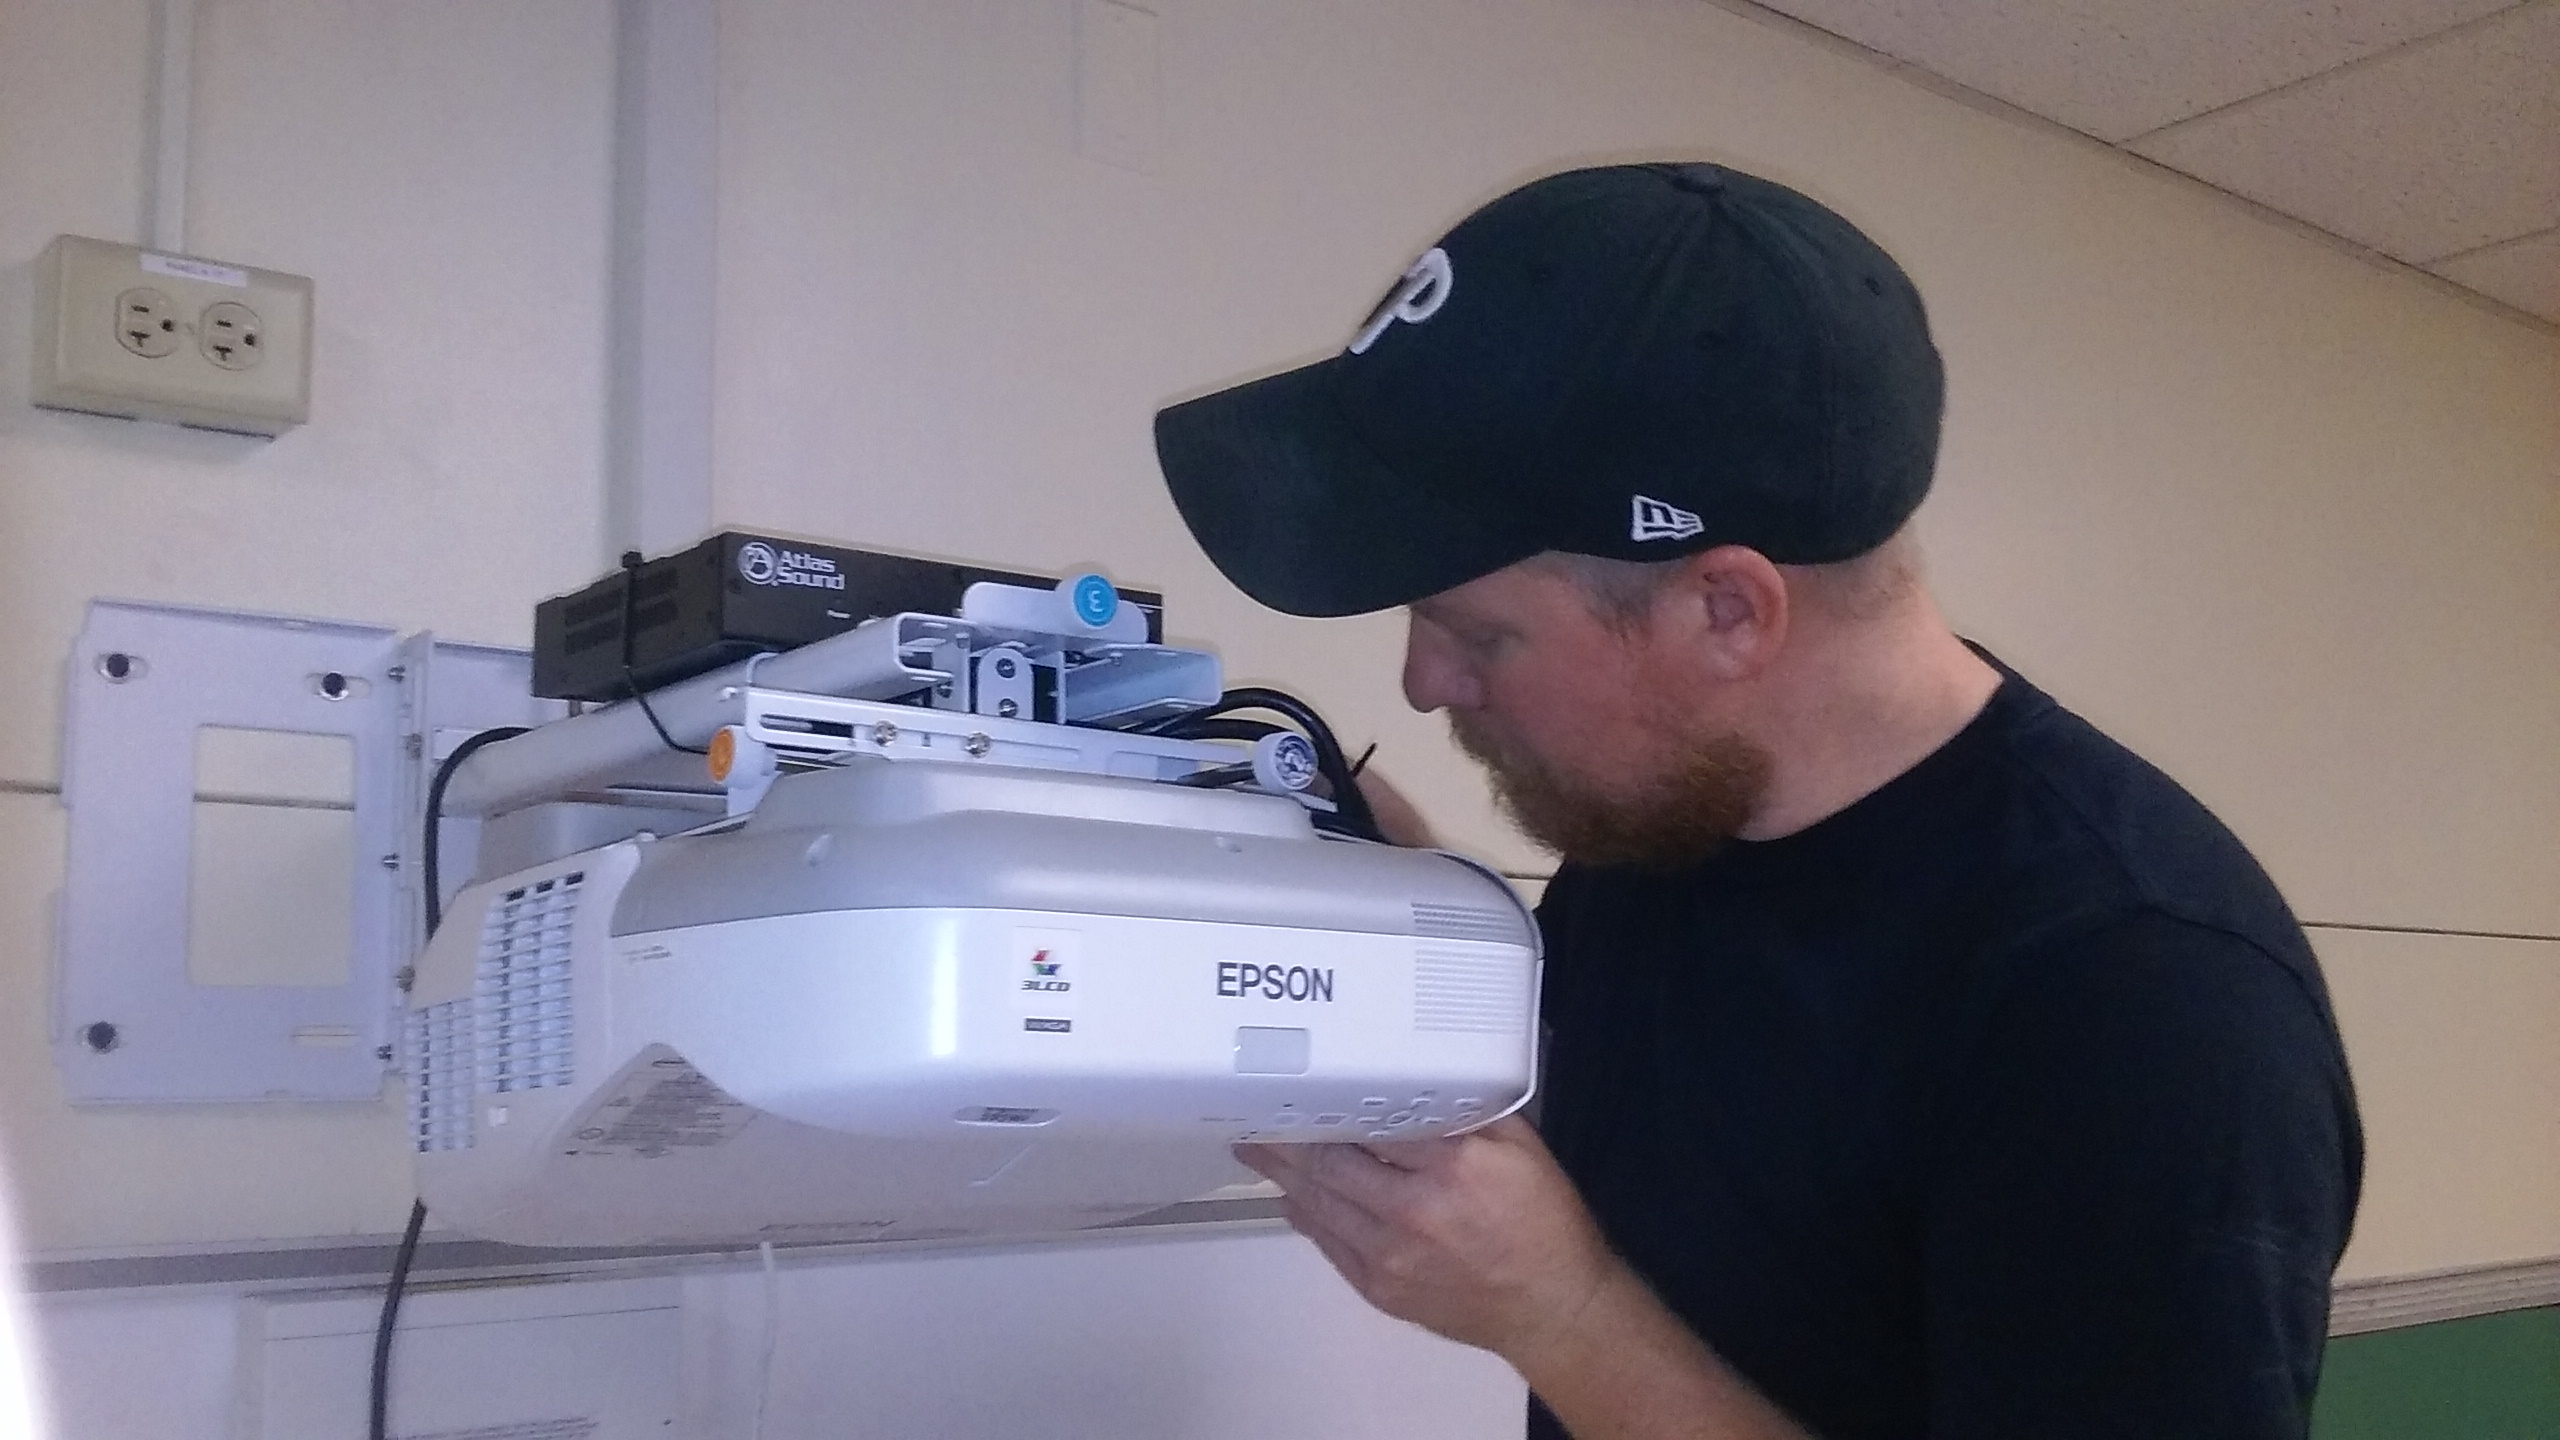 Technical Video Inc. installs high-tech equipment in 70 local classrooms